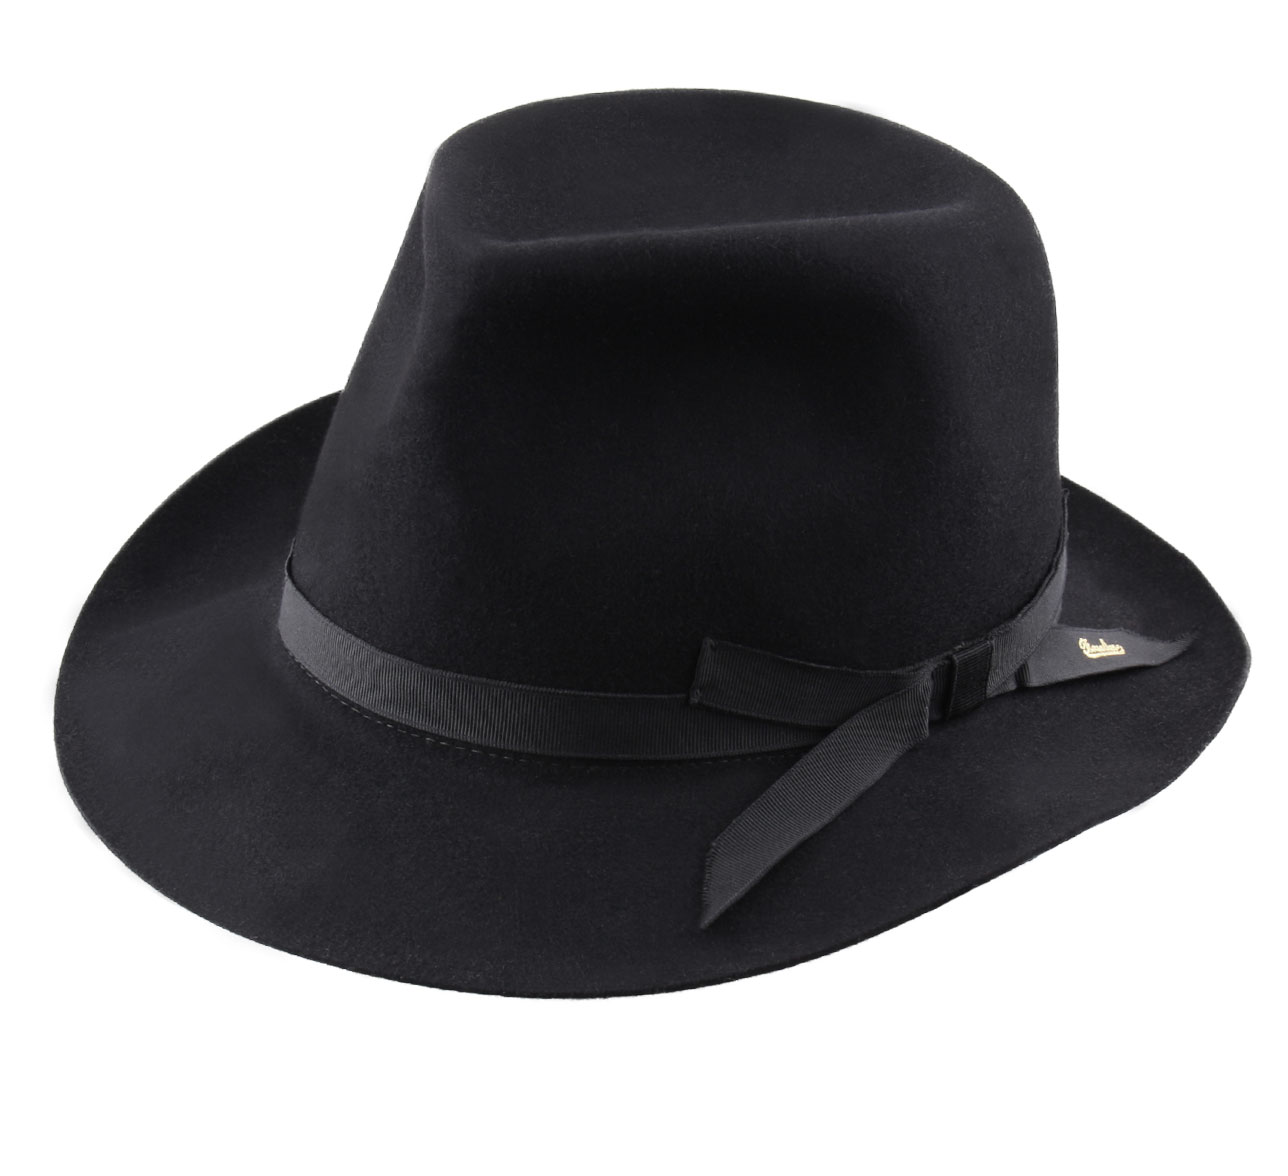 d6ebcc2afc0 Borsalino Hats Near Me - Parchment N Lead